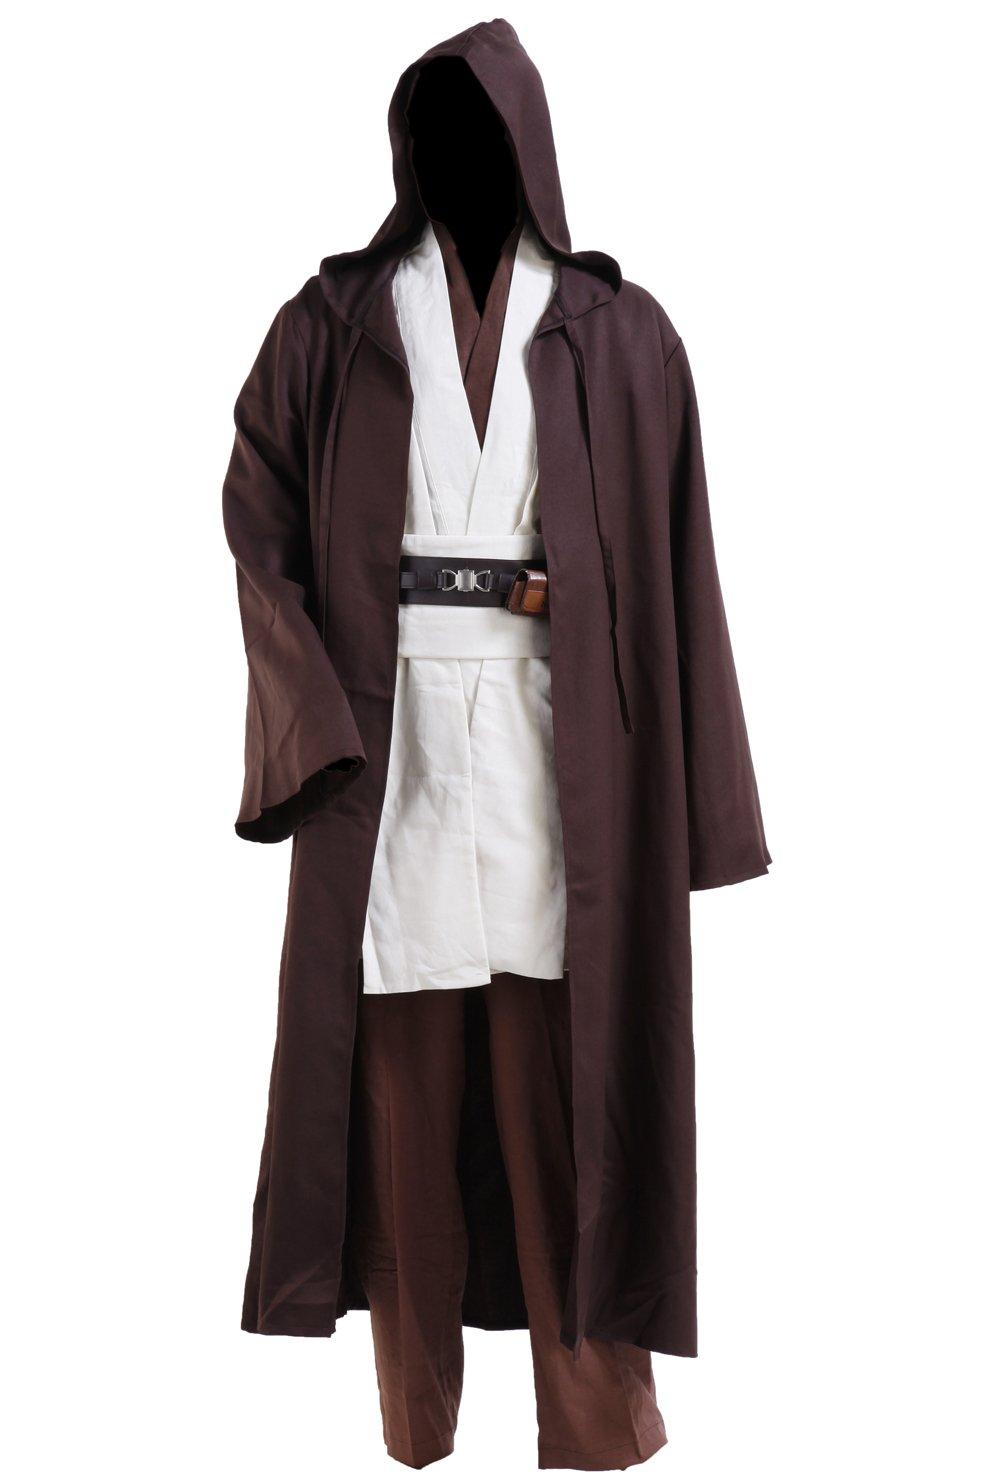 Fashion Costumes Men's Star Wars Jedi Robe Costume -Brown with White Version